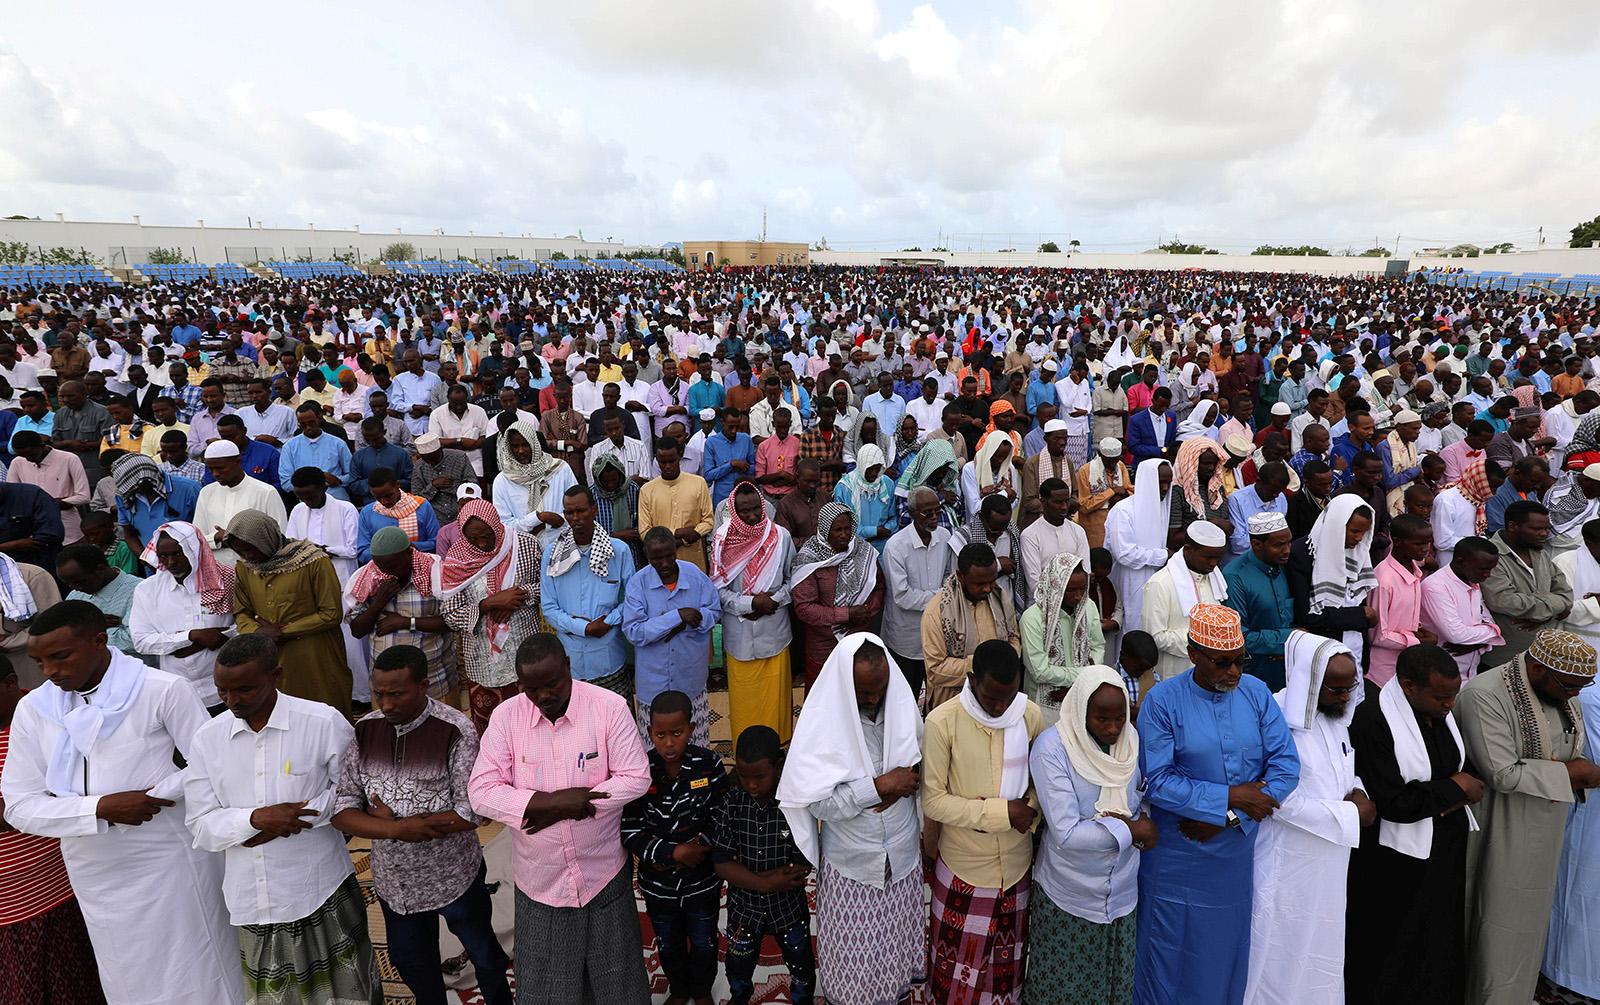 Muslim faithful attend Eid al-Fitr prayers to mark the end of the holy fasting month of Ramadan inside the soccer stadium in Hodan district of Mogadishu